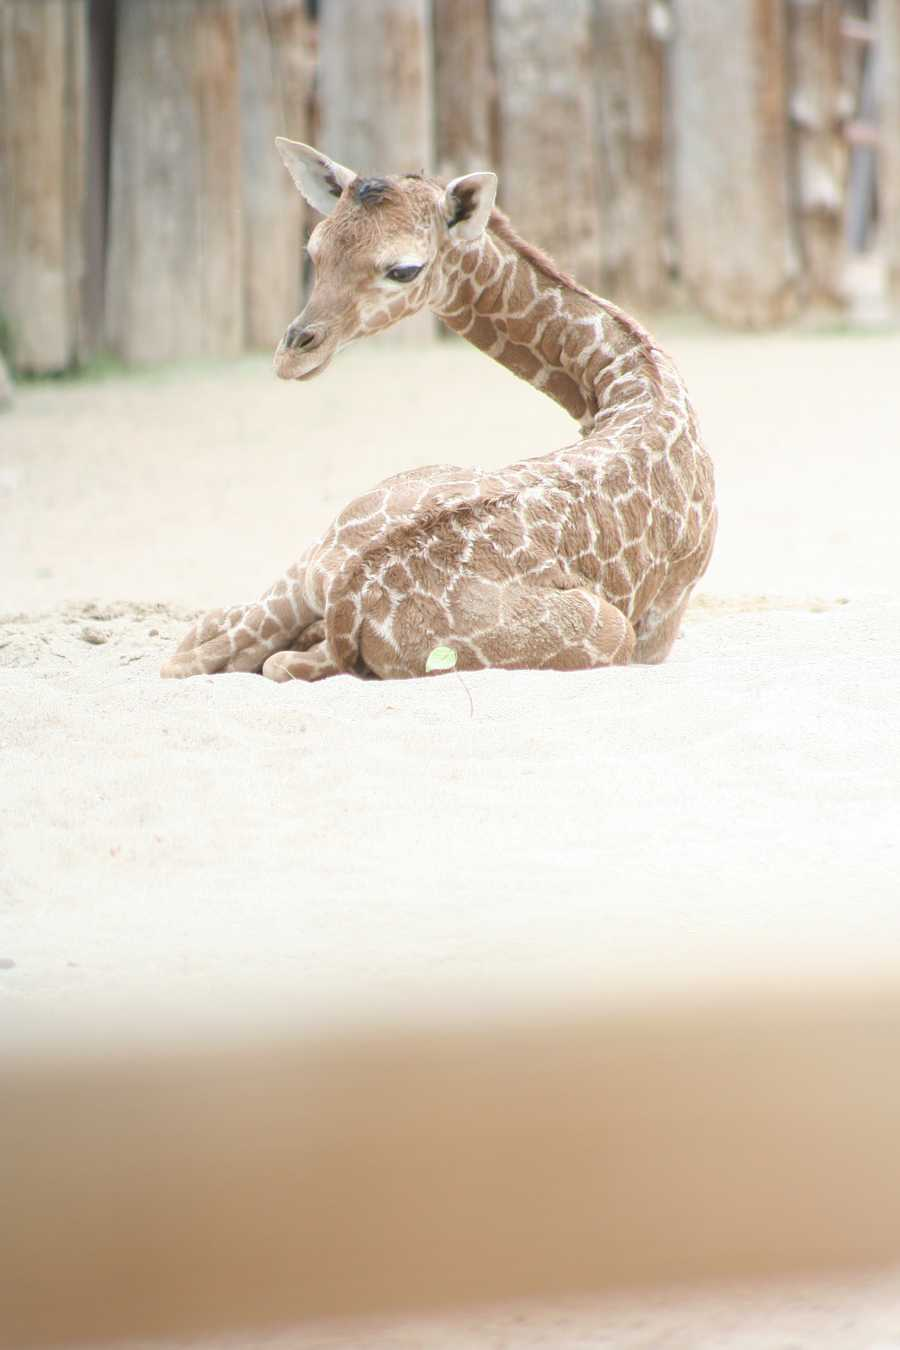 CLICK HERE for more information on giraffe feedings.